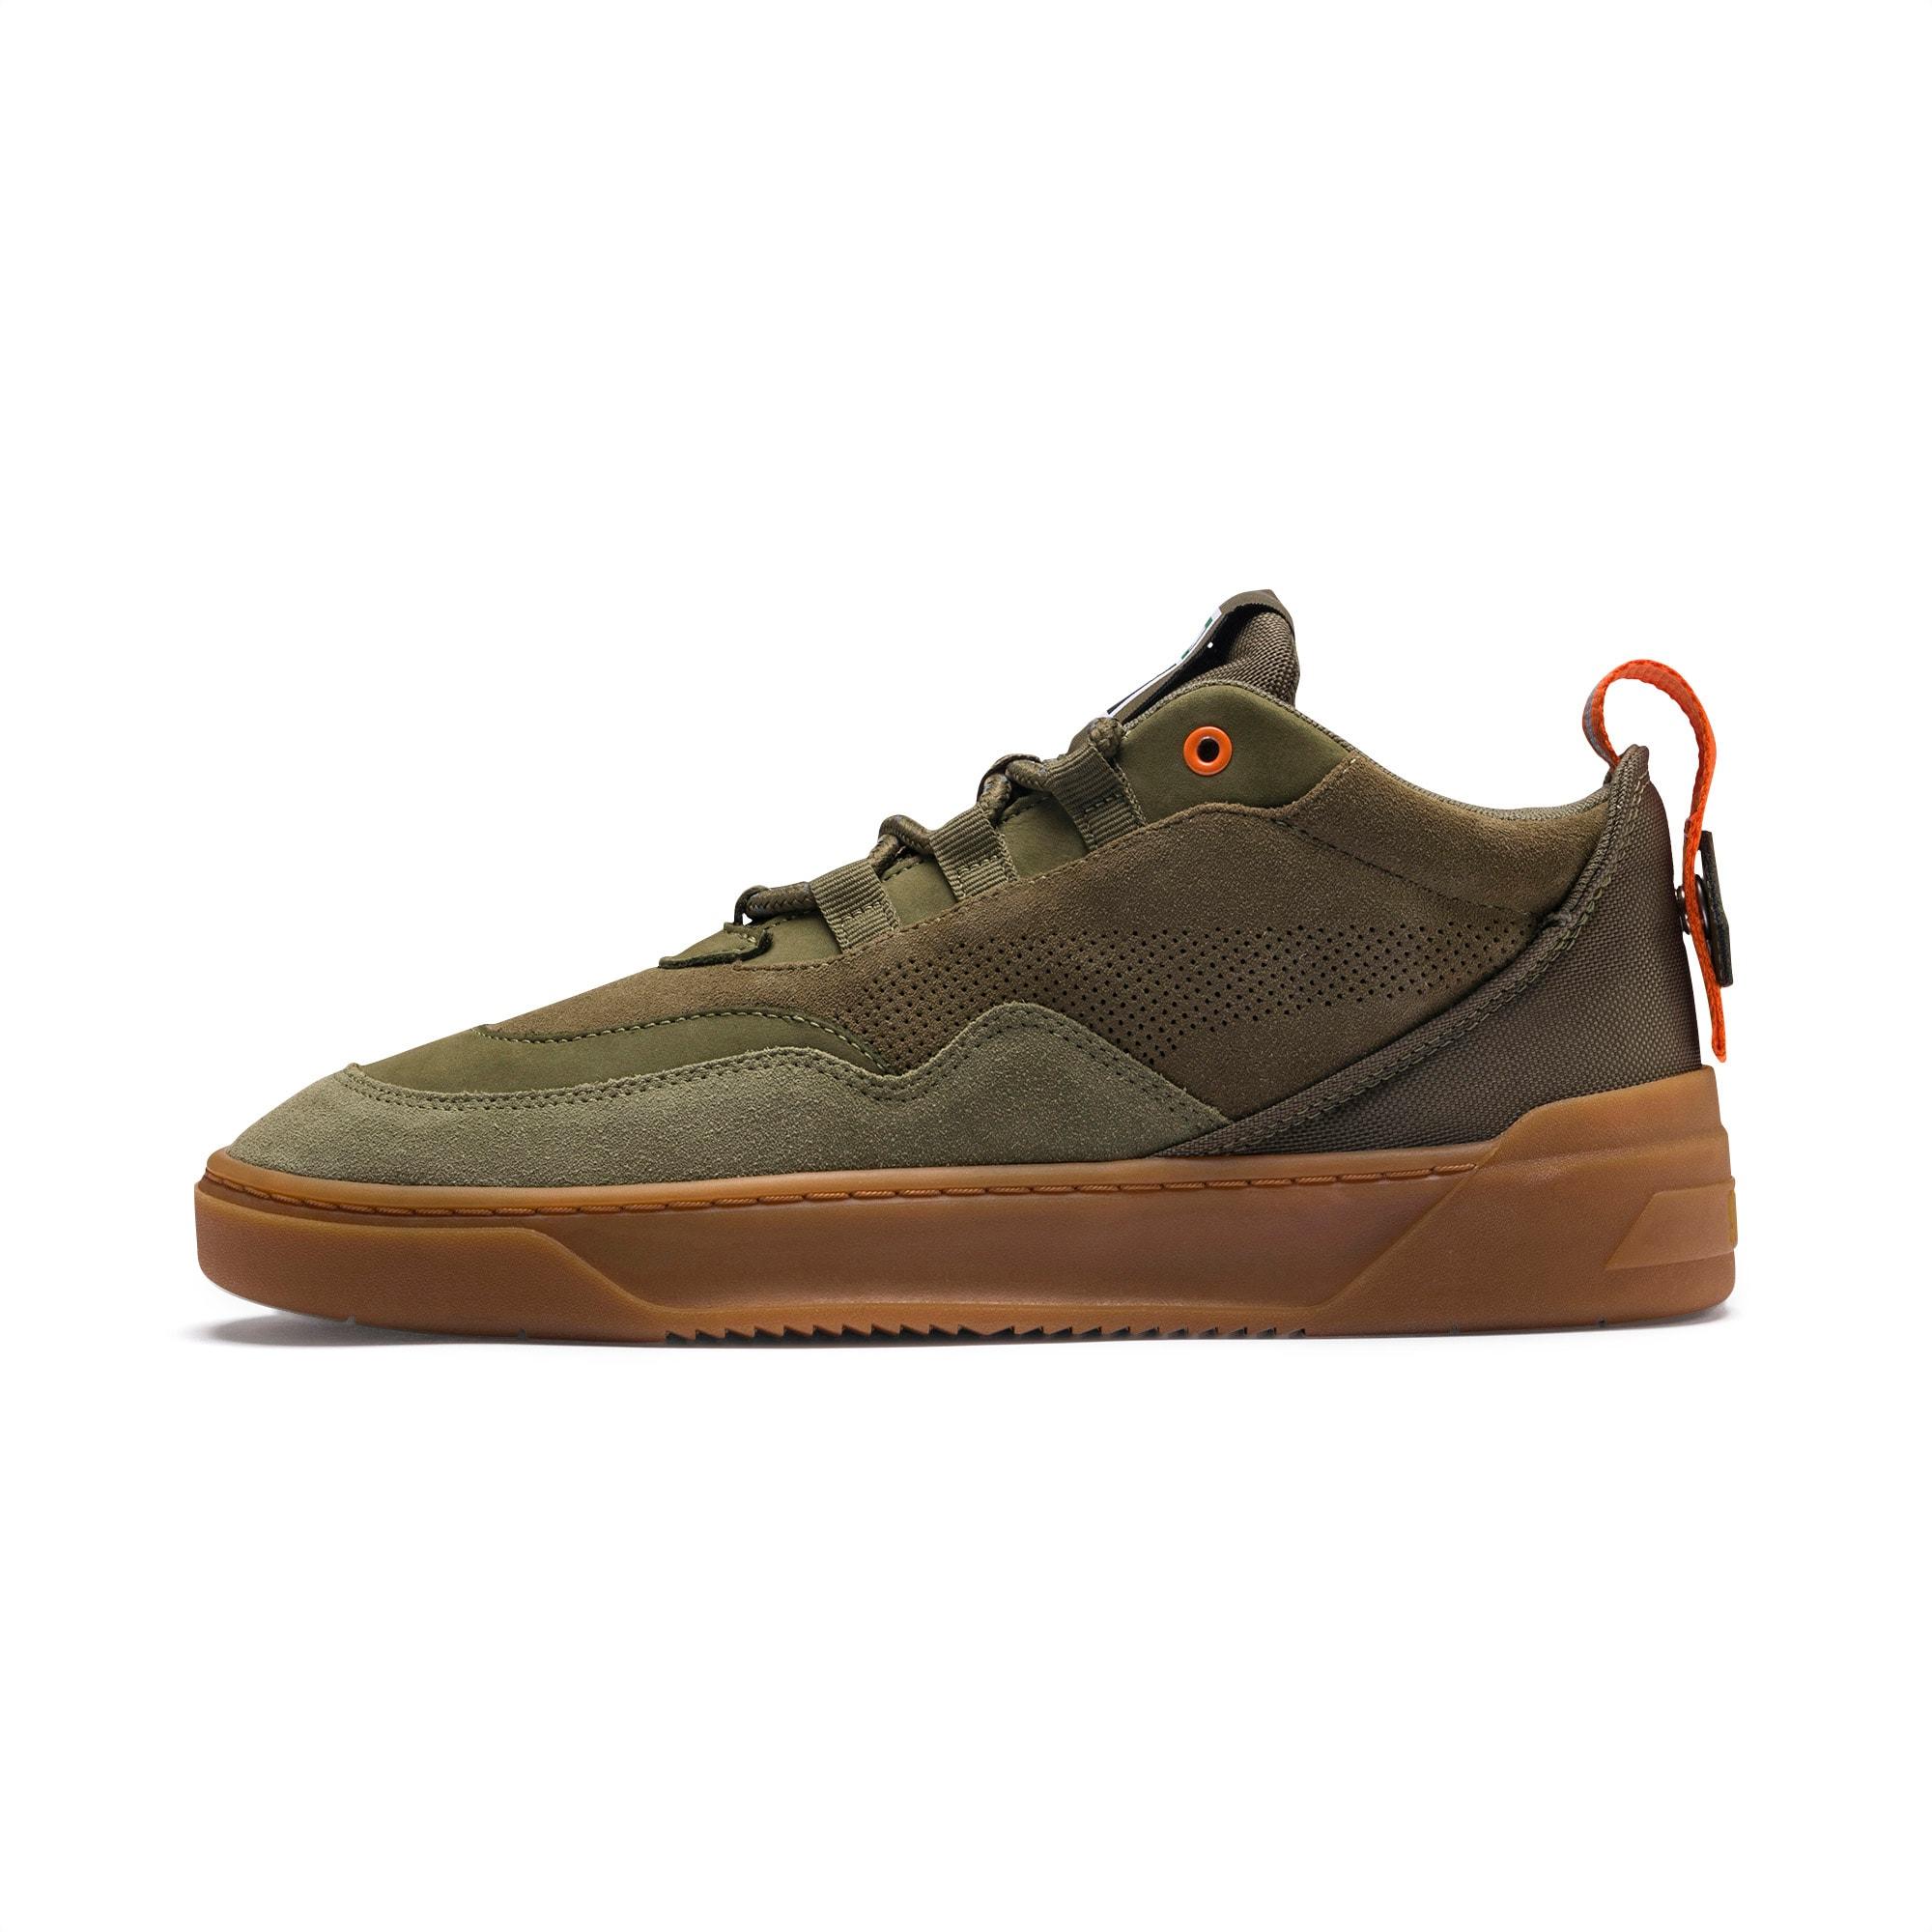 Cali Zero Demi Army Green Sneakers